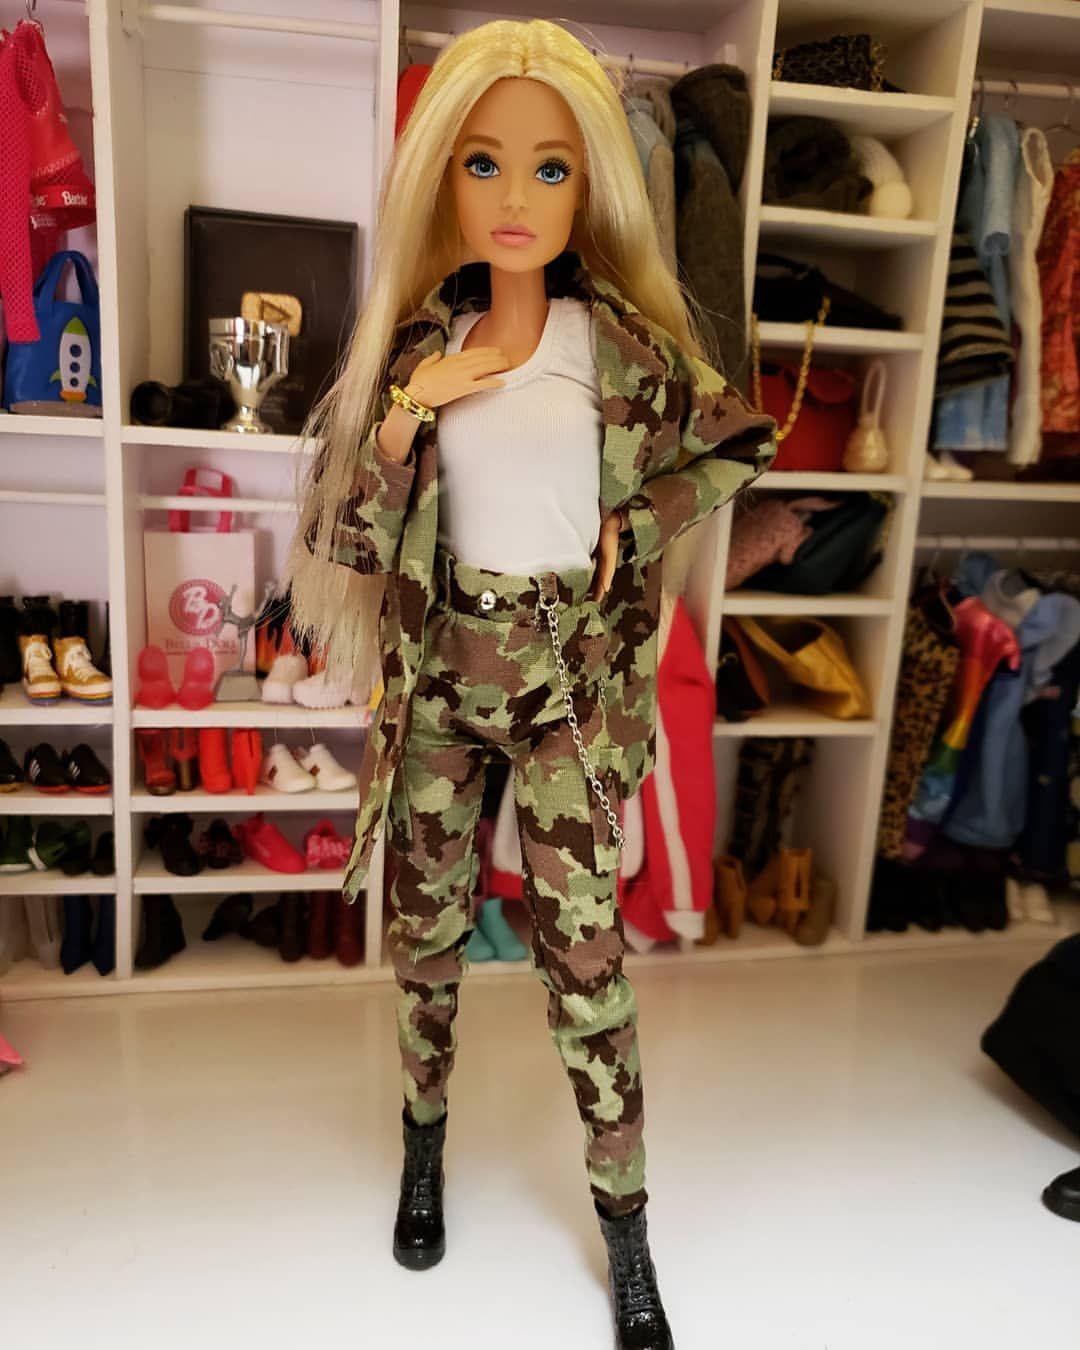 Yaya Hernz No Instagram Mattel Barbiedoll Mattelbarbie Barbie Doll Mtmbarbie Mattelbarbies Dollhouse M In 2020 Barbie Dolls Made To Move Barbie Barbie Girl